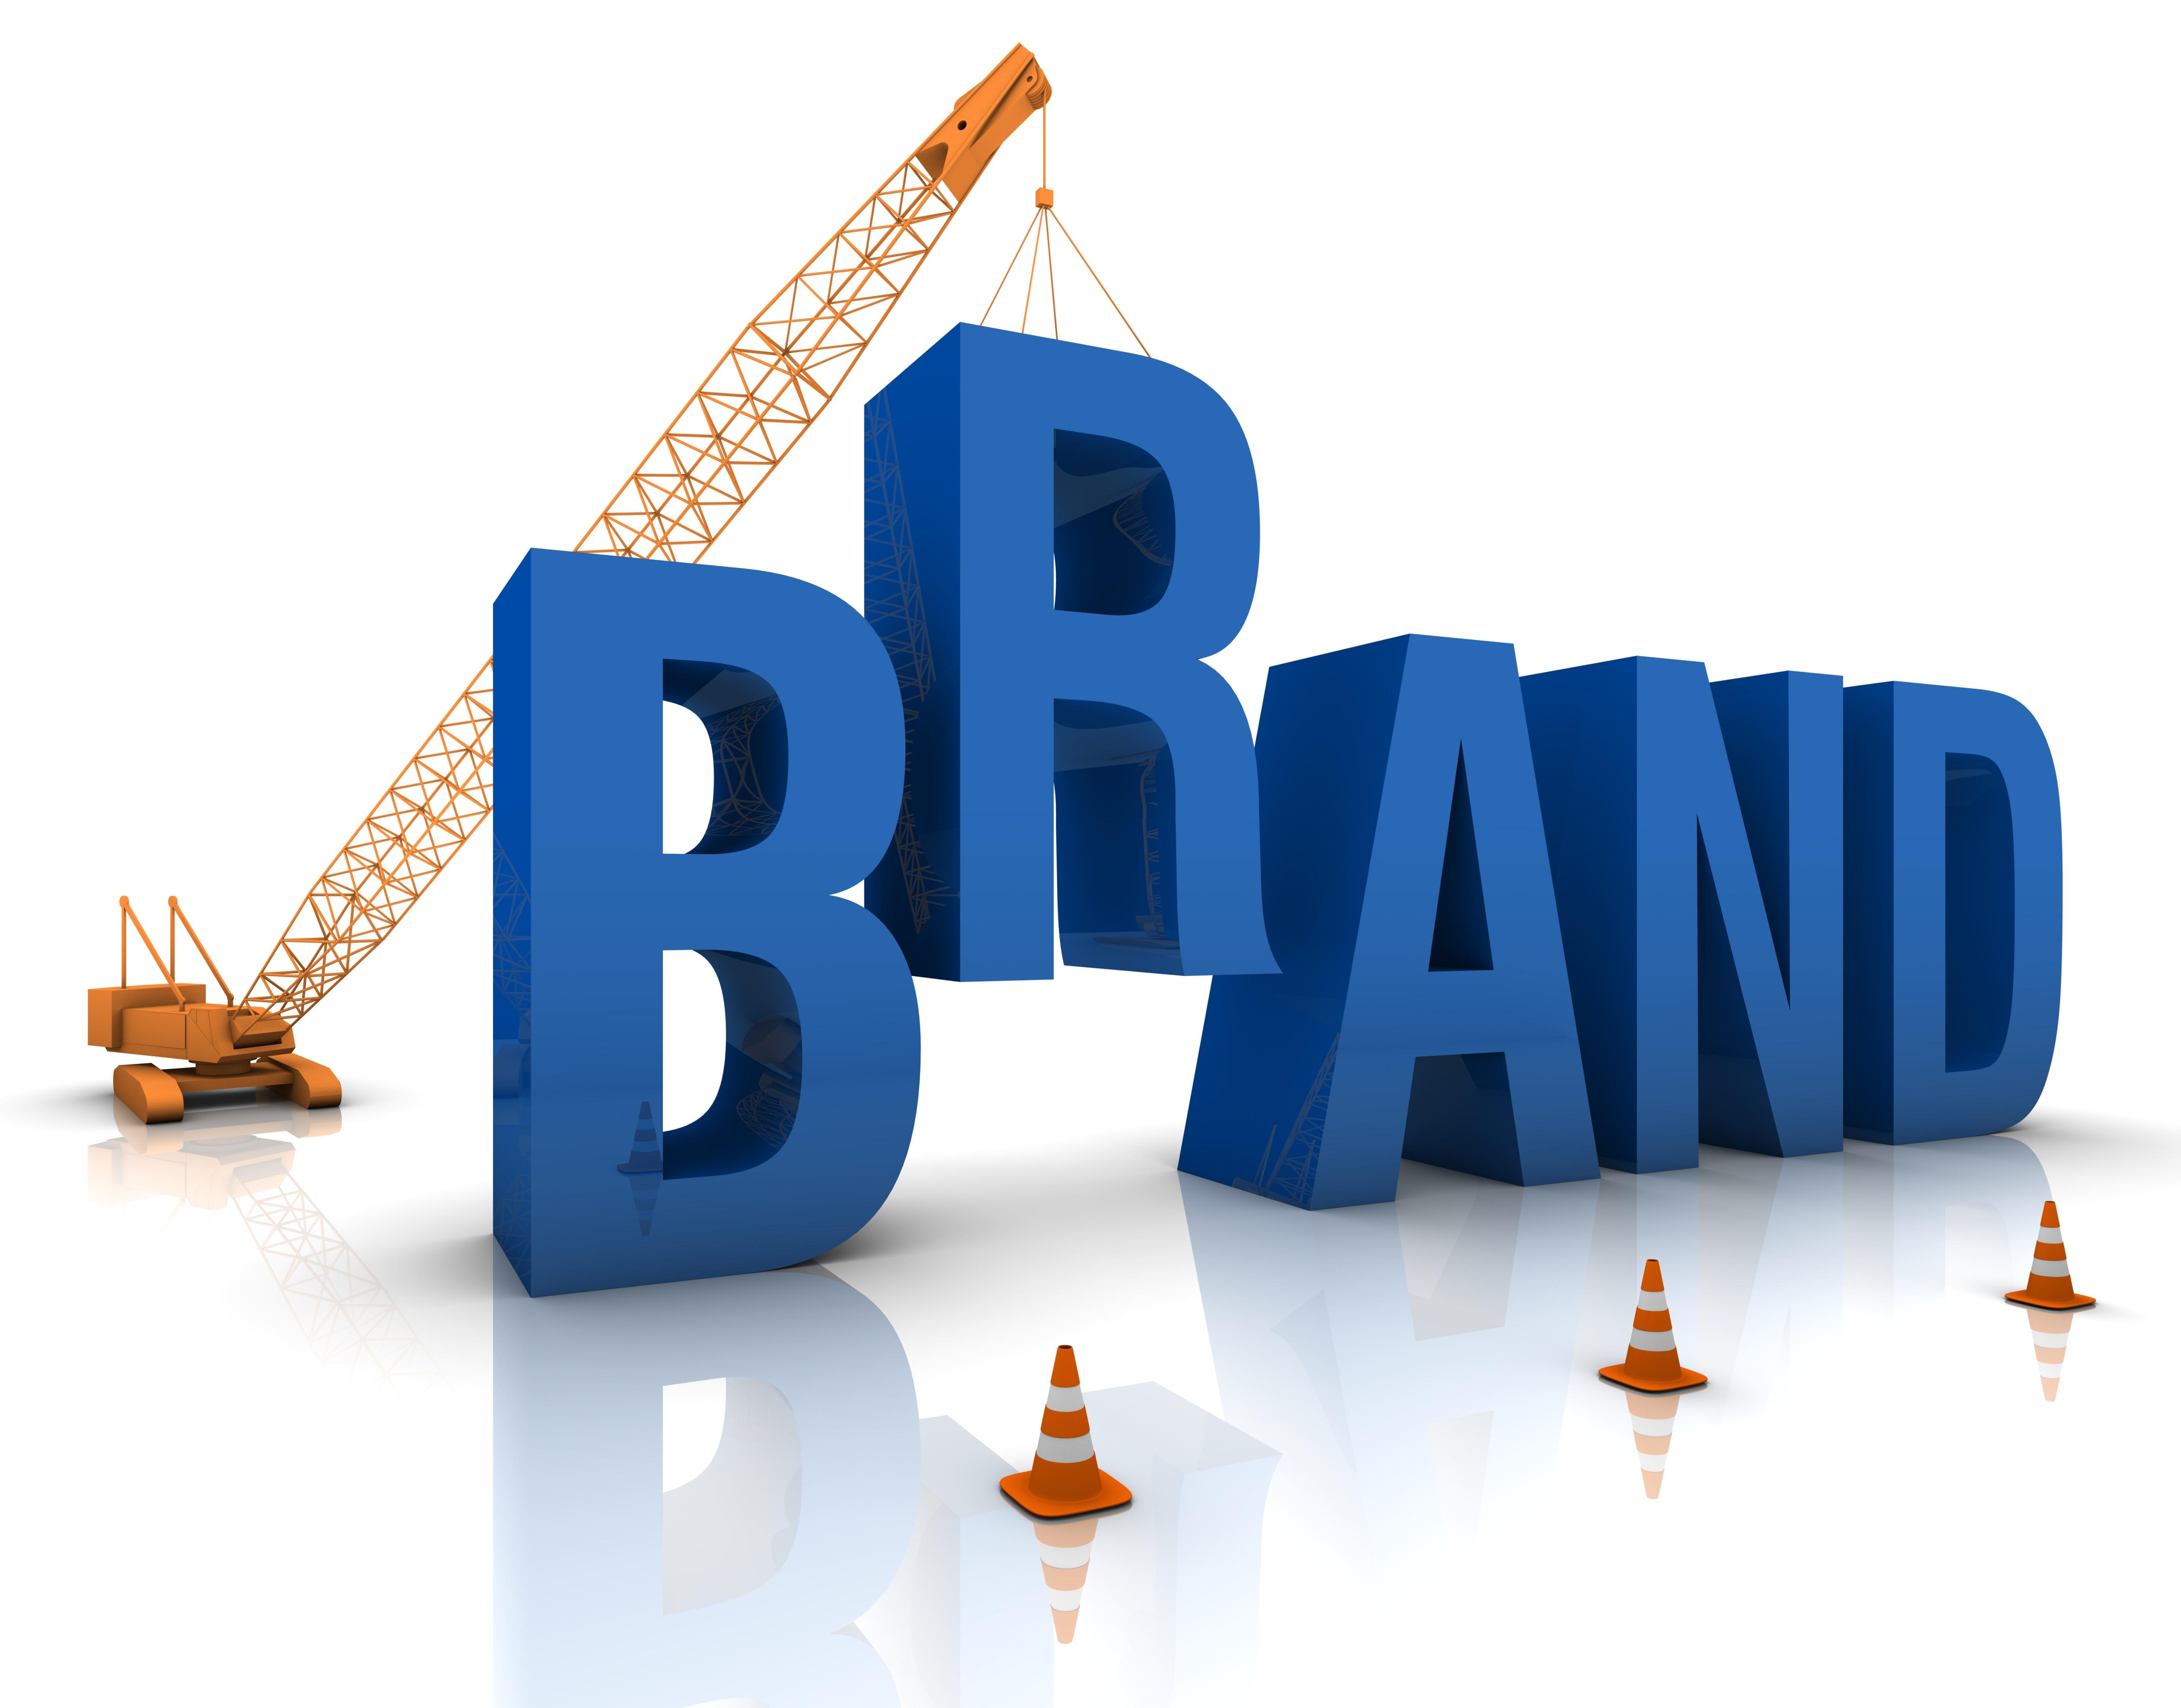 Brand building CMB